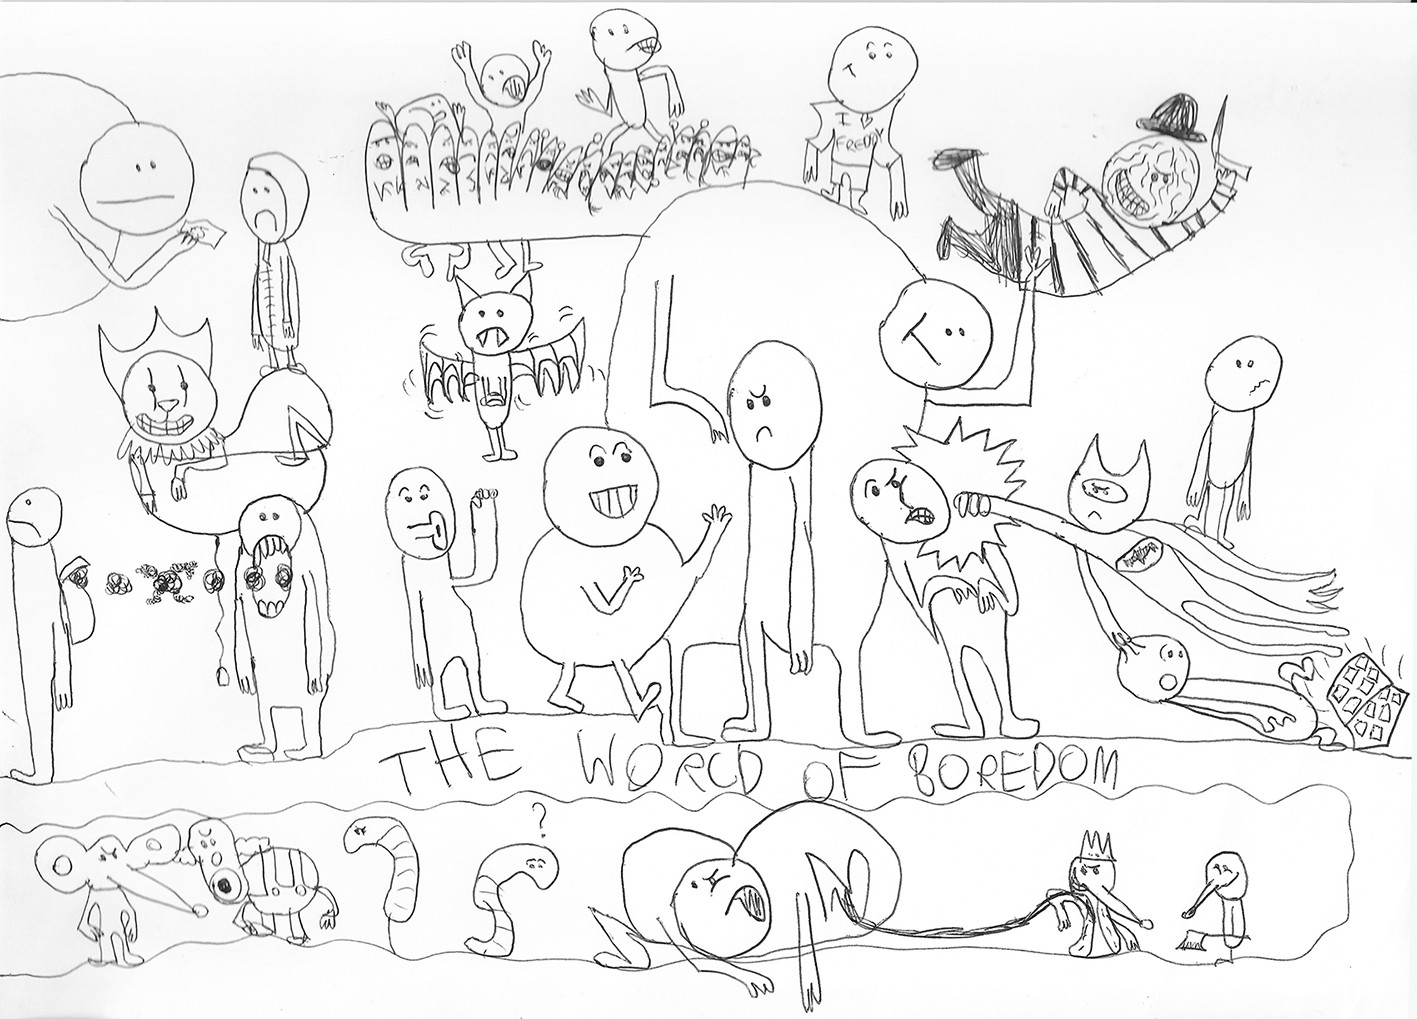 World of Boredom